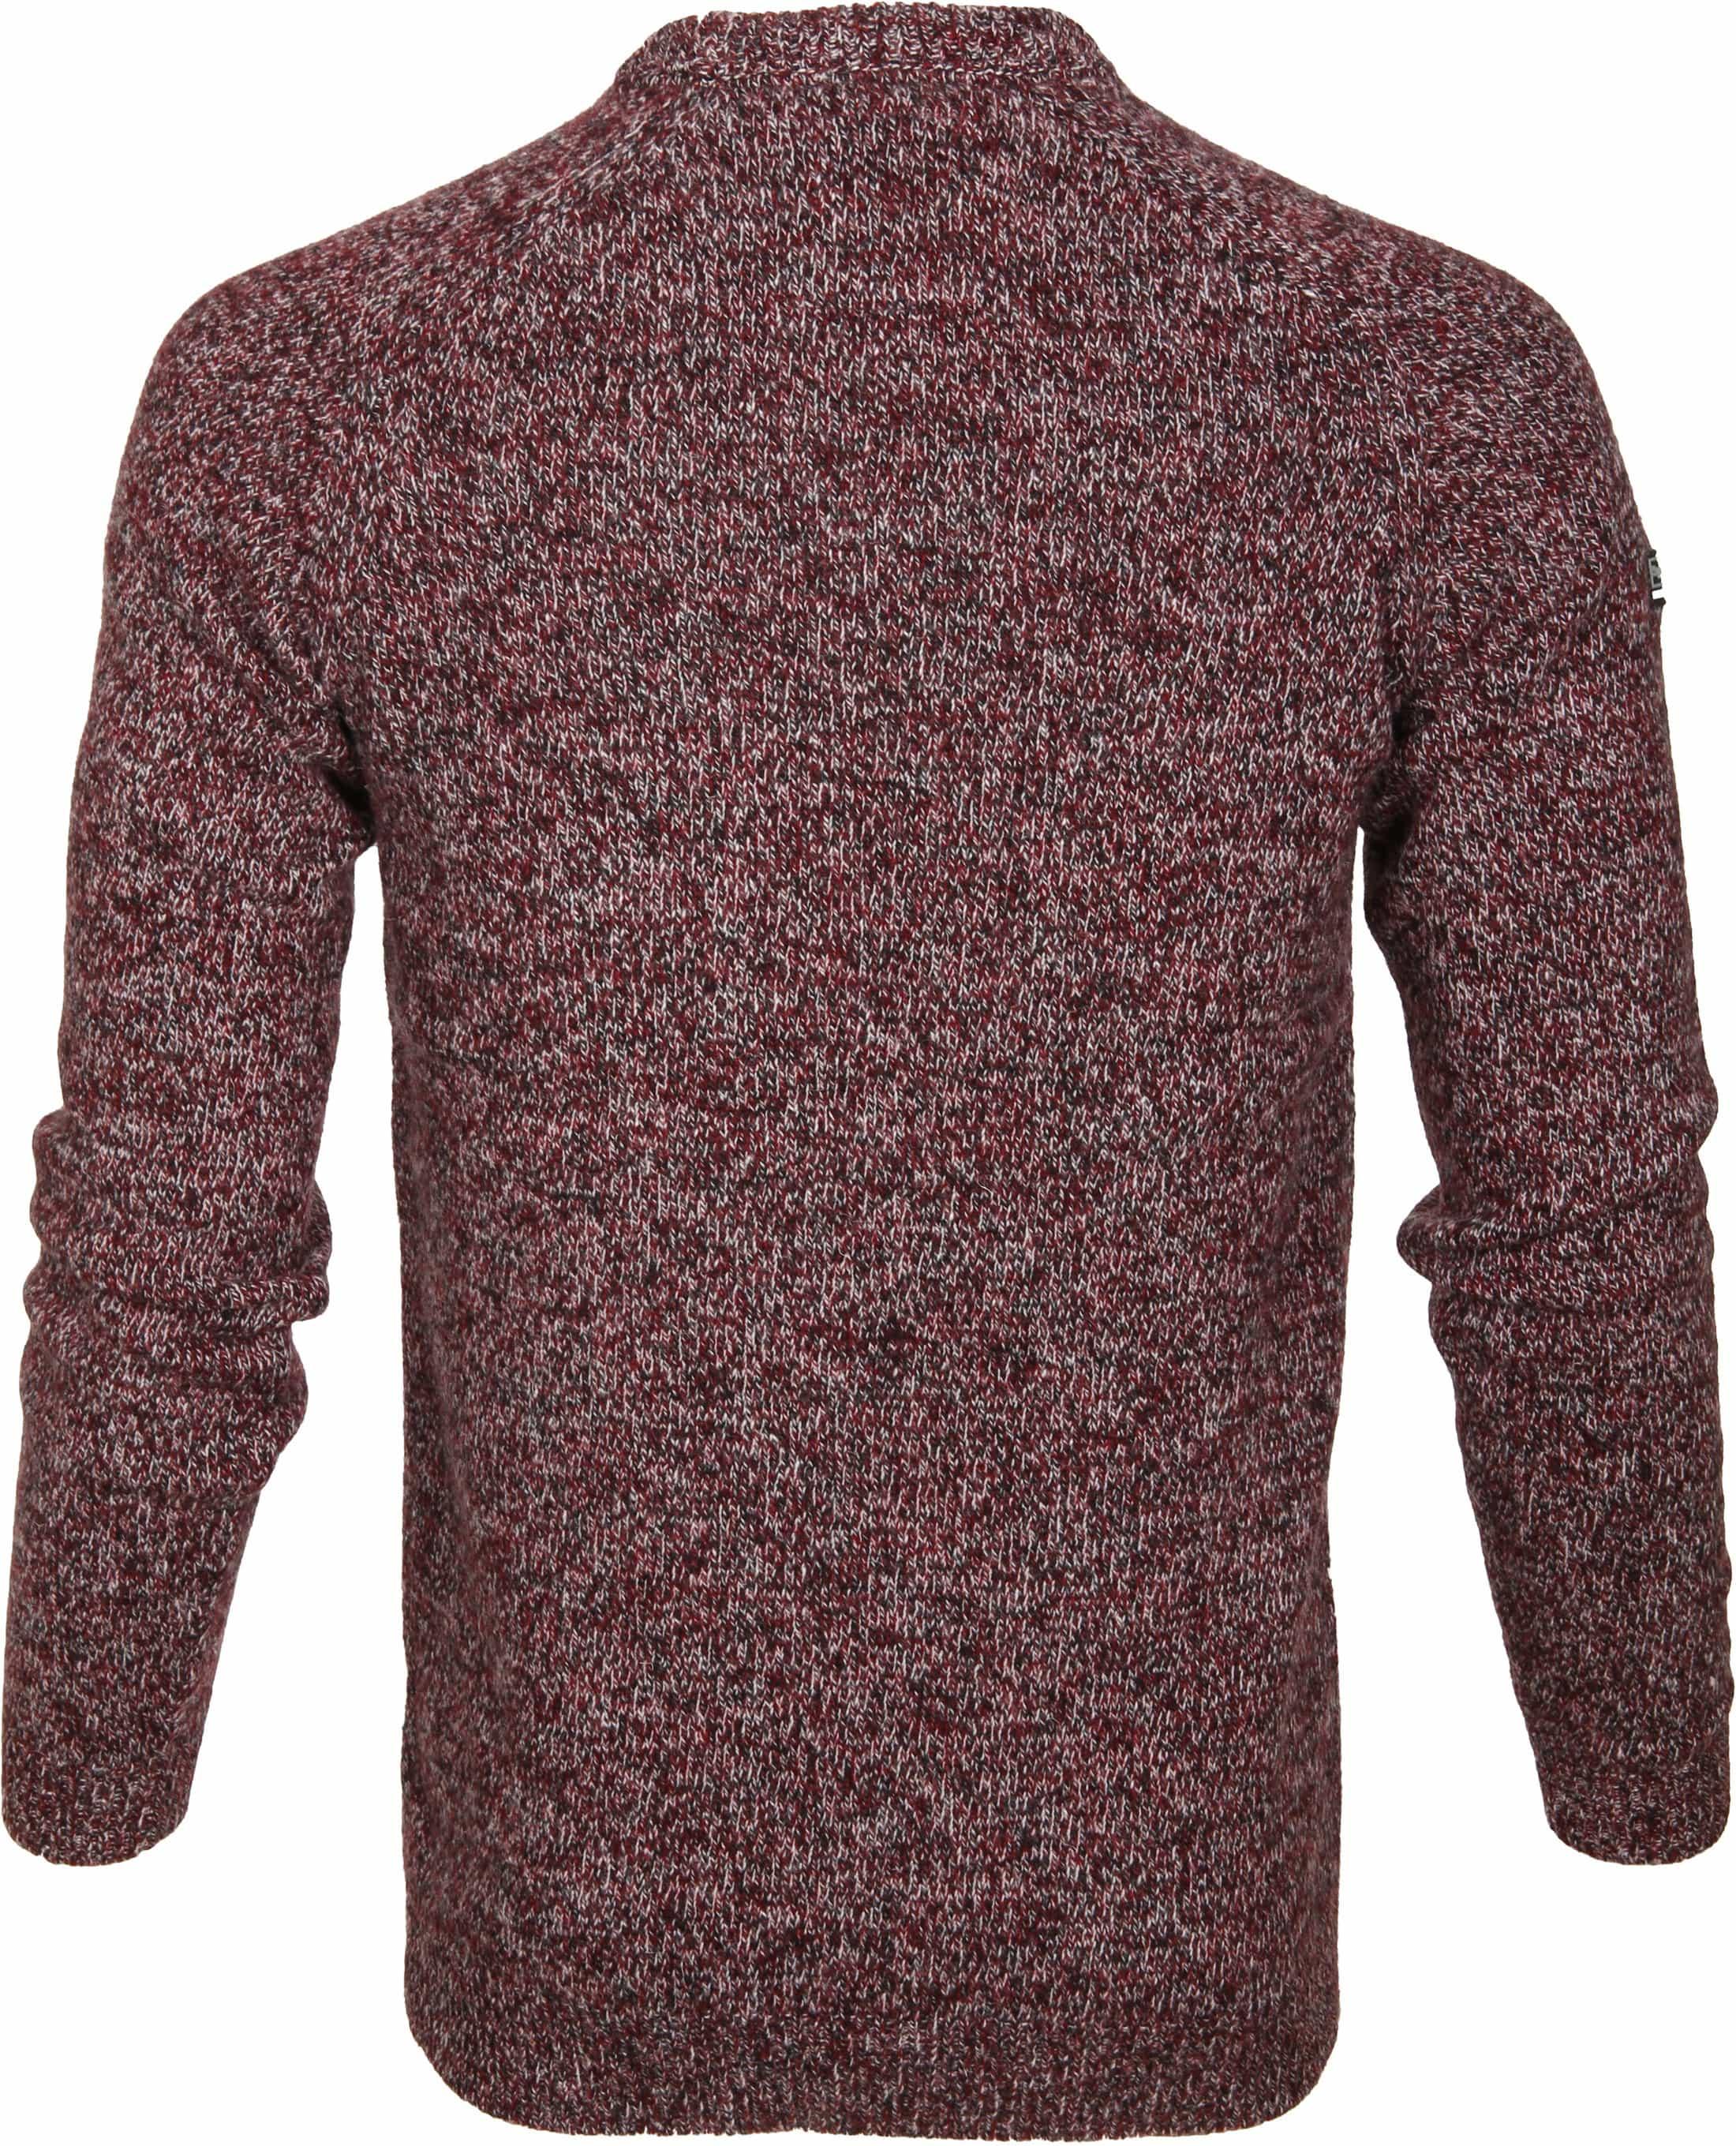 Superdry Sweater Wol Bordeaux foto 4